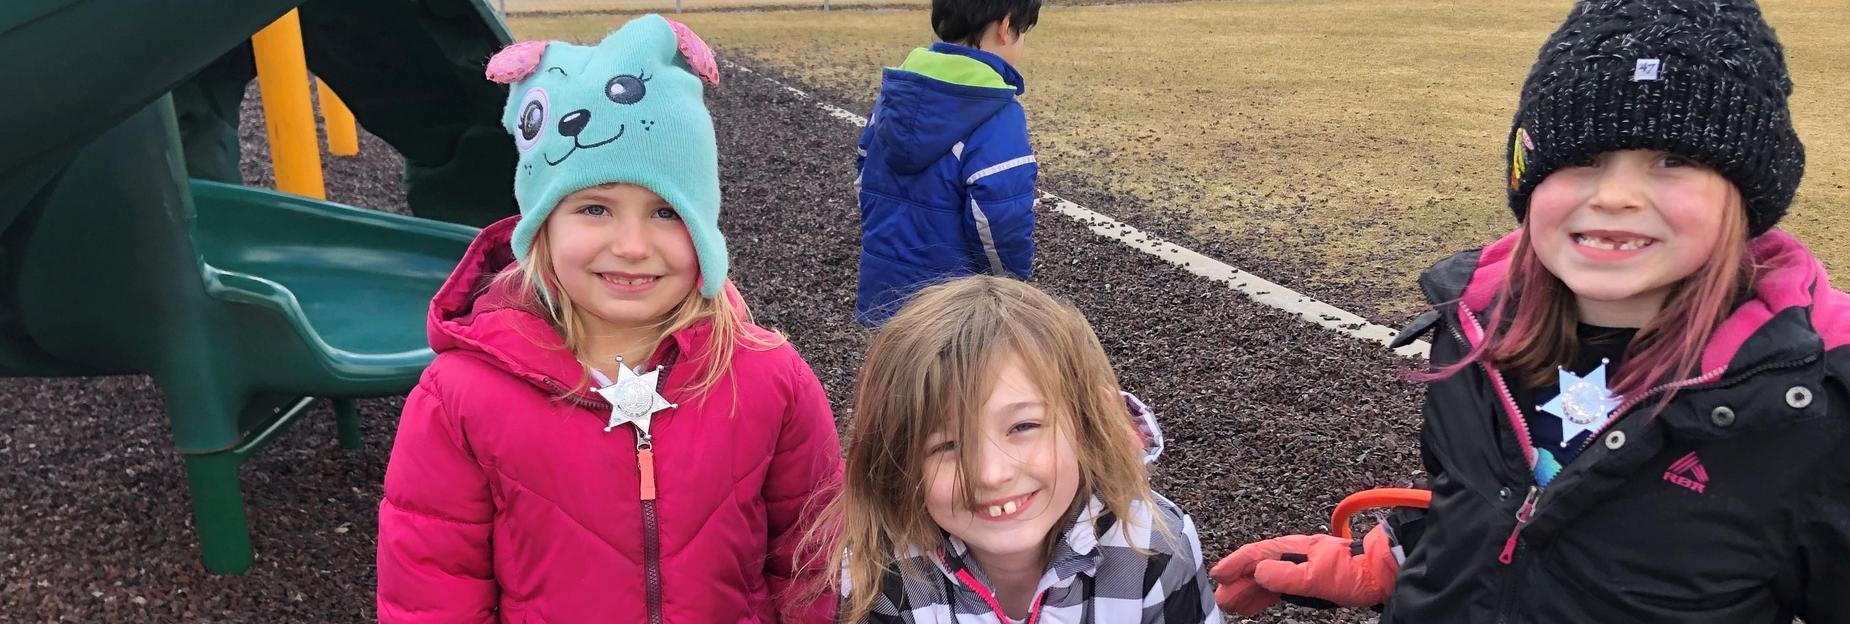 CCECC playground friends